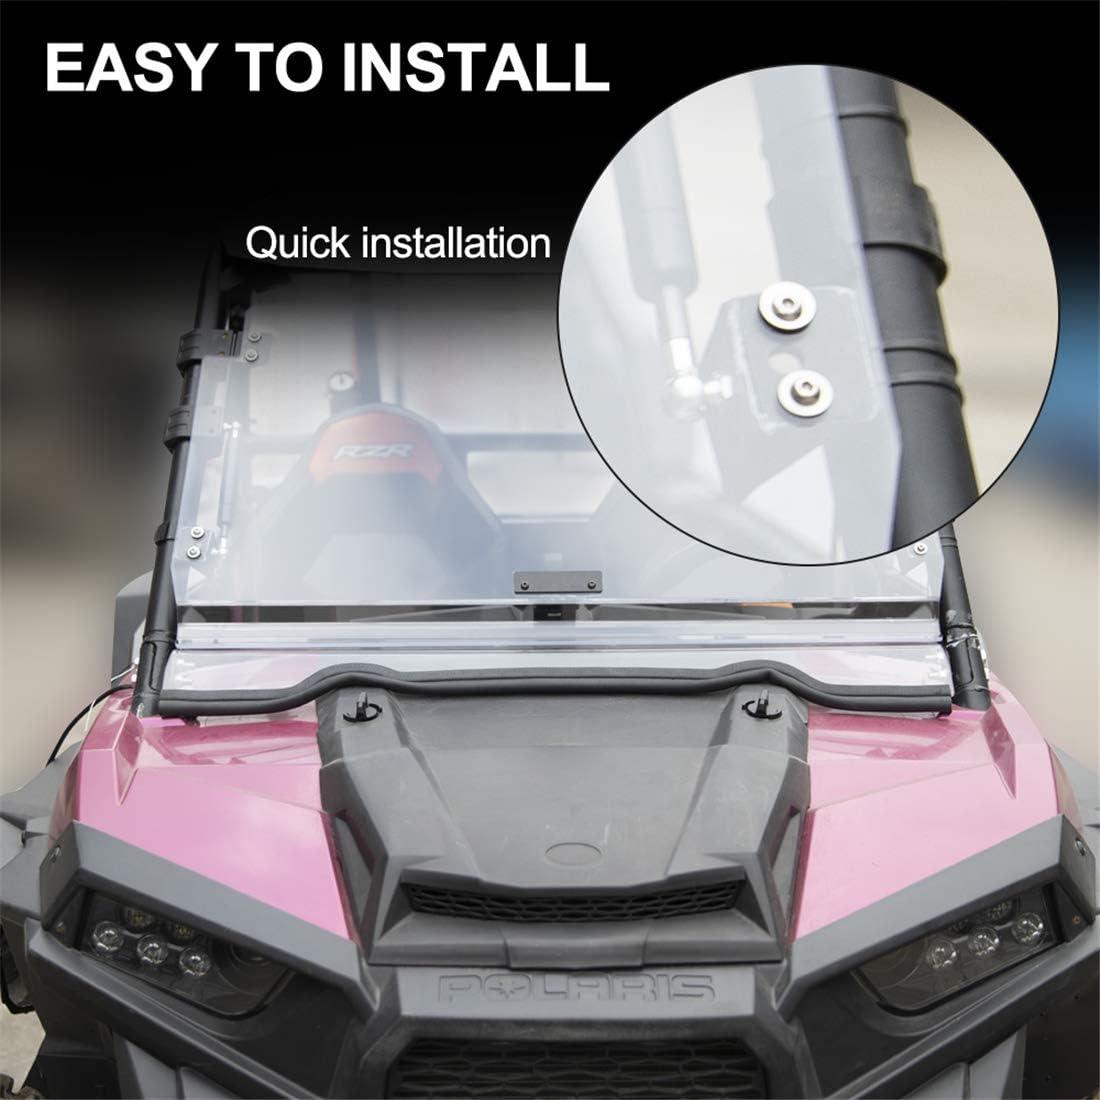 KIWI MASTER Heavy Duty 3-IN-1 Flip Windshield Compatible for 2014-2018 Polaris RZR XP 1000 Scratch Resistant